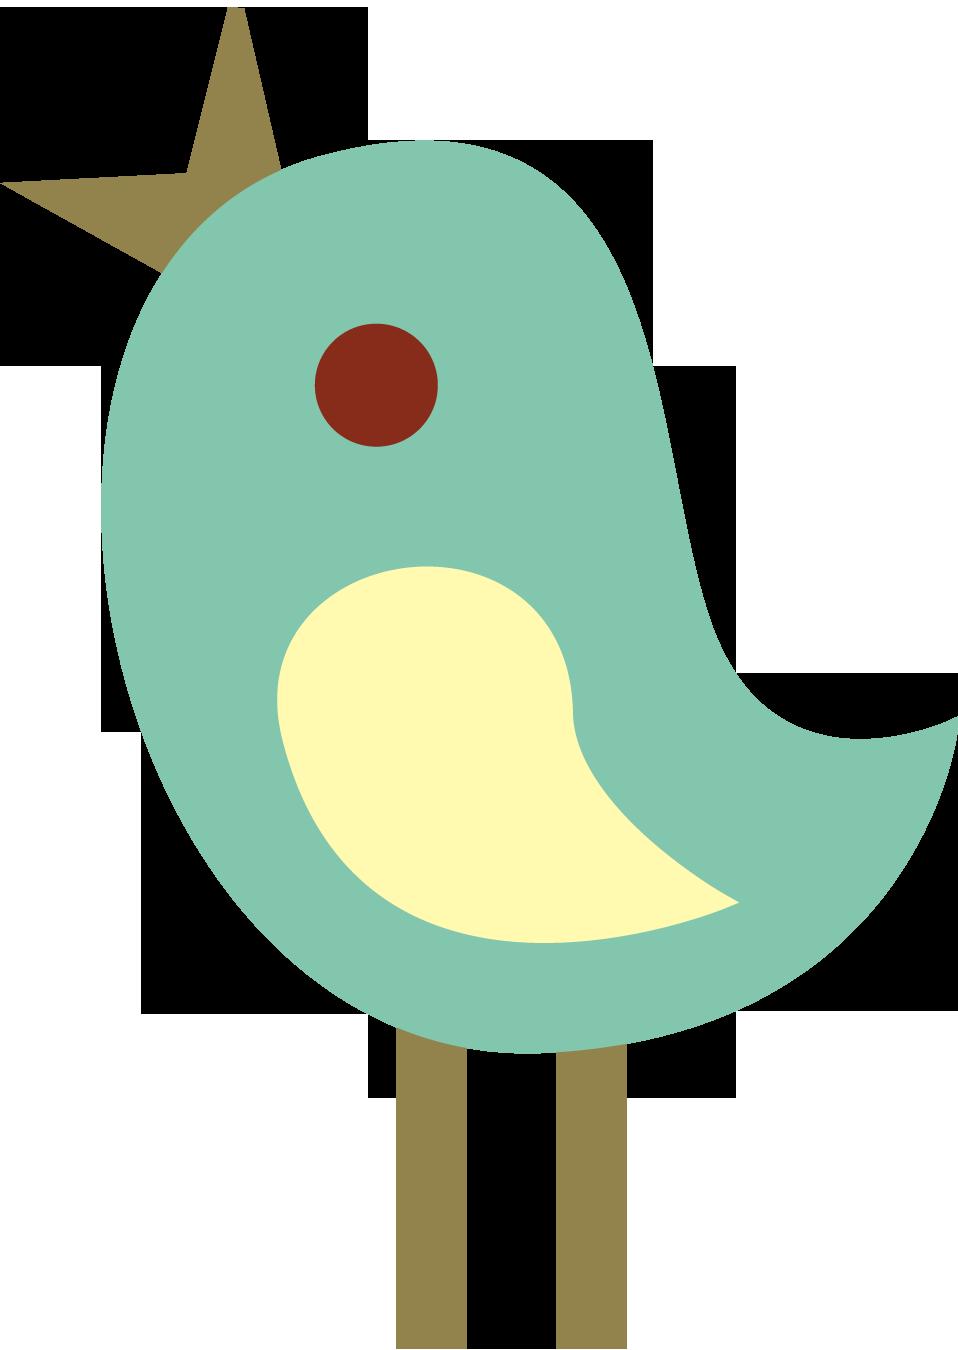 Cute Tweet Birds Clip Art Free Clipart G-Cute Tweet Birds Clip Art Free Clipart Graphics Revidevi Wordpress-9